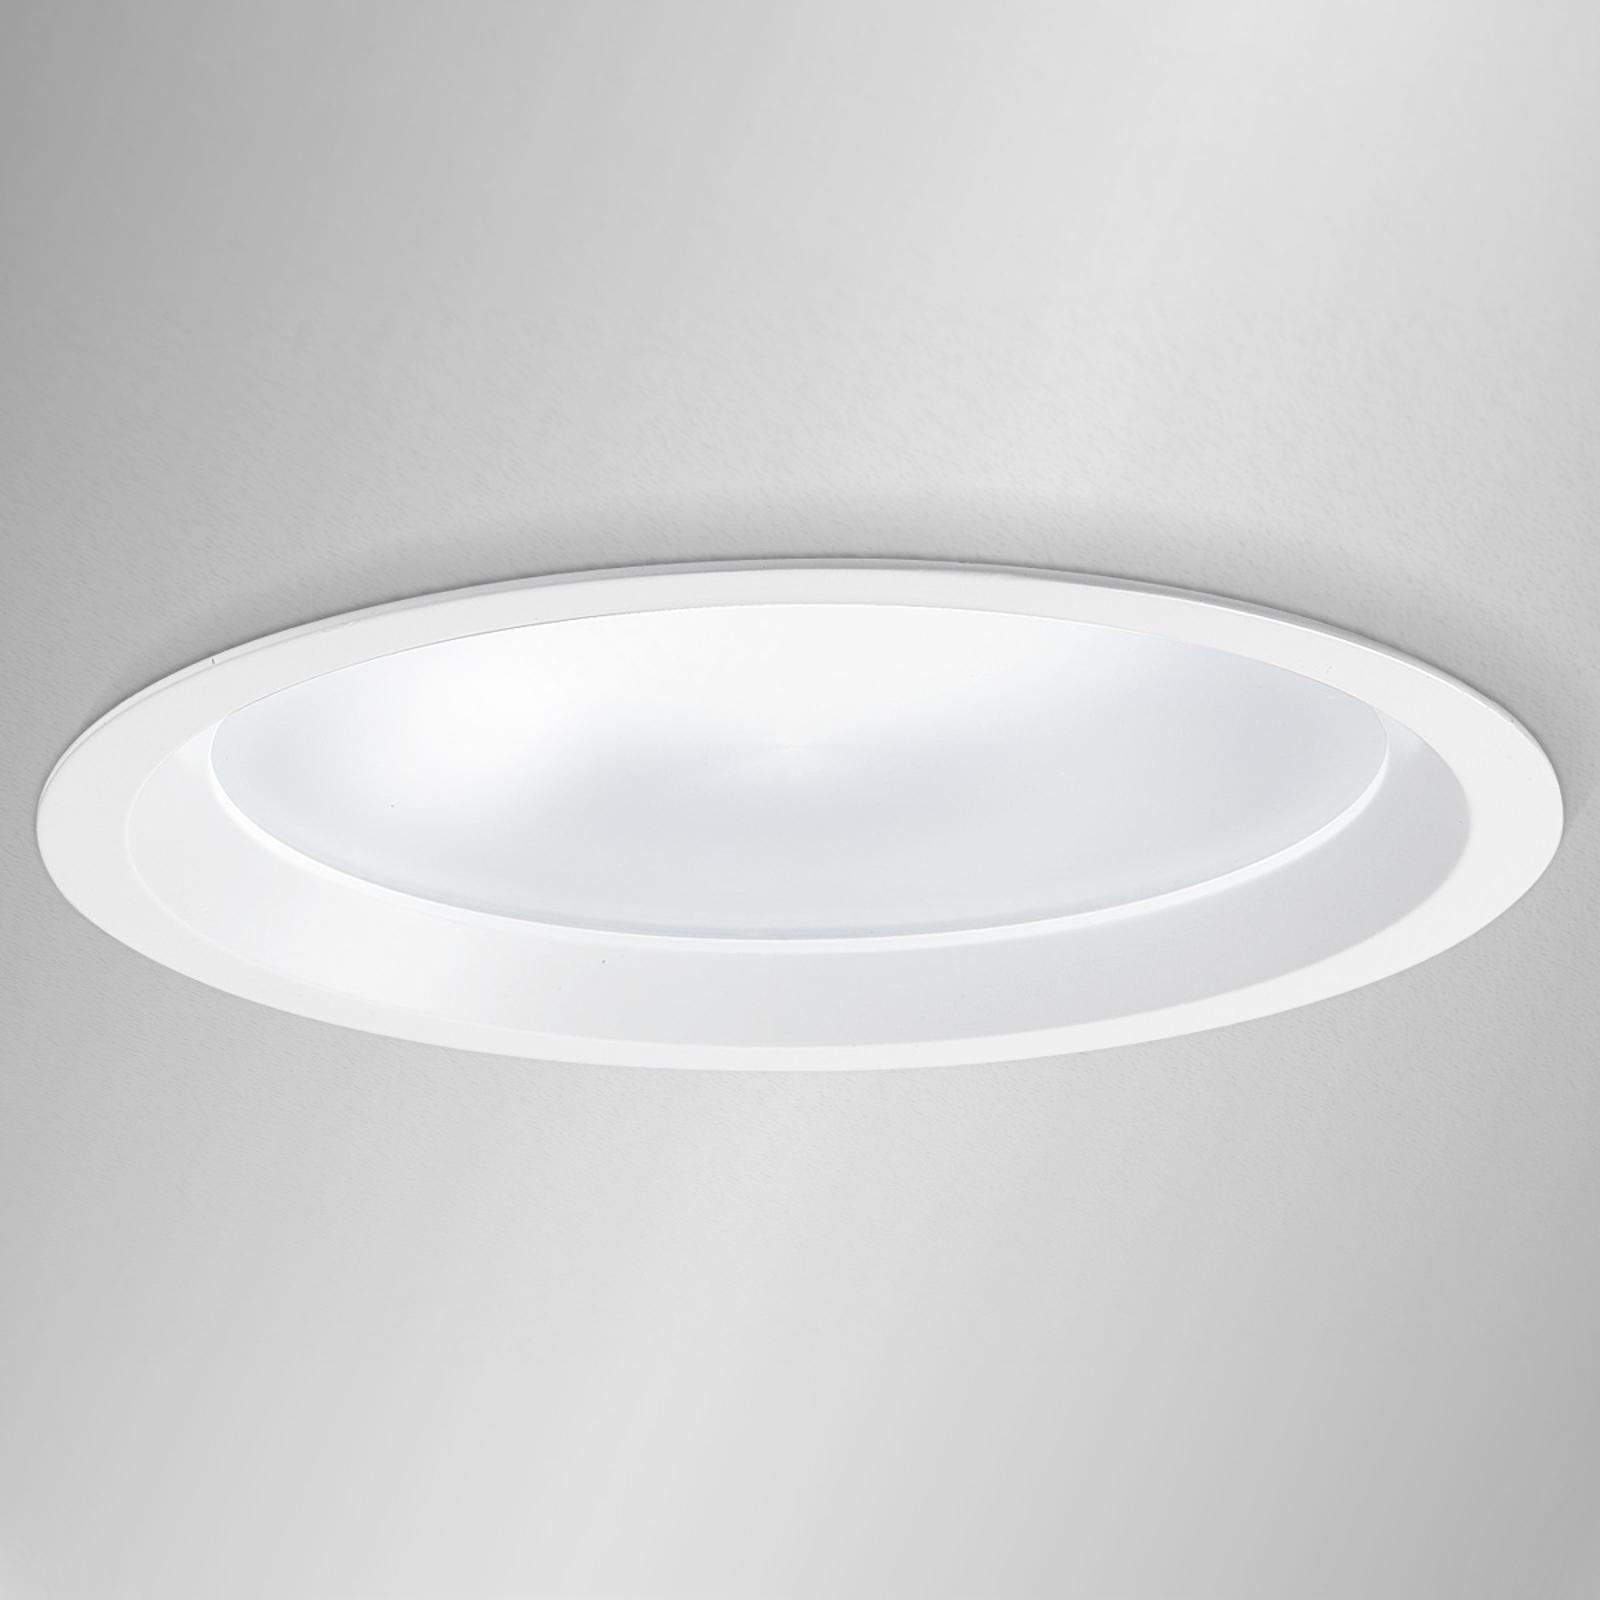 23 cm diameter - LED-takinbyggnadslampa Strato 230